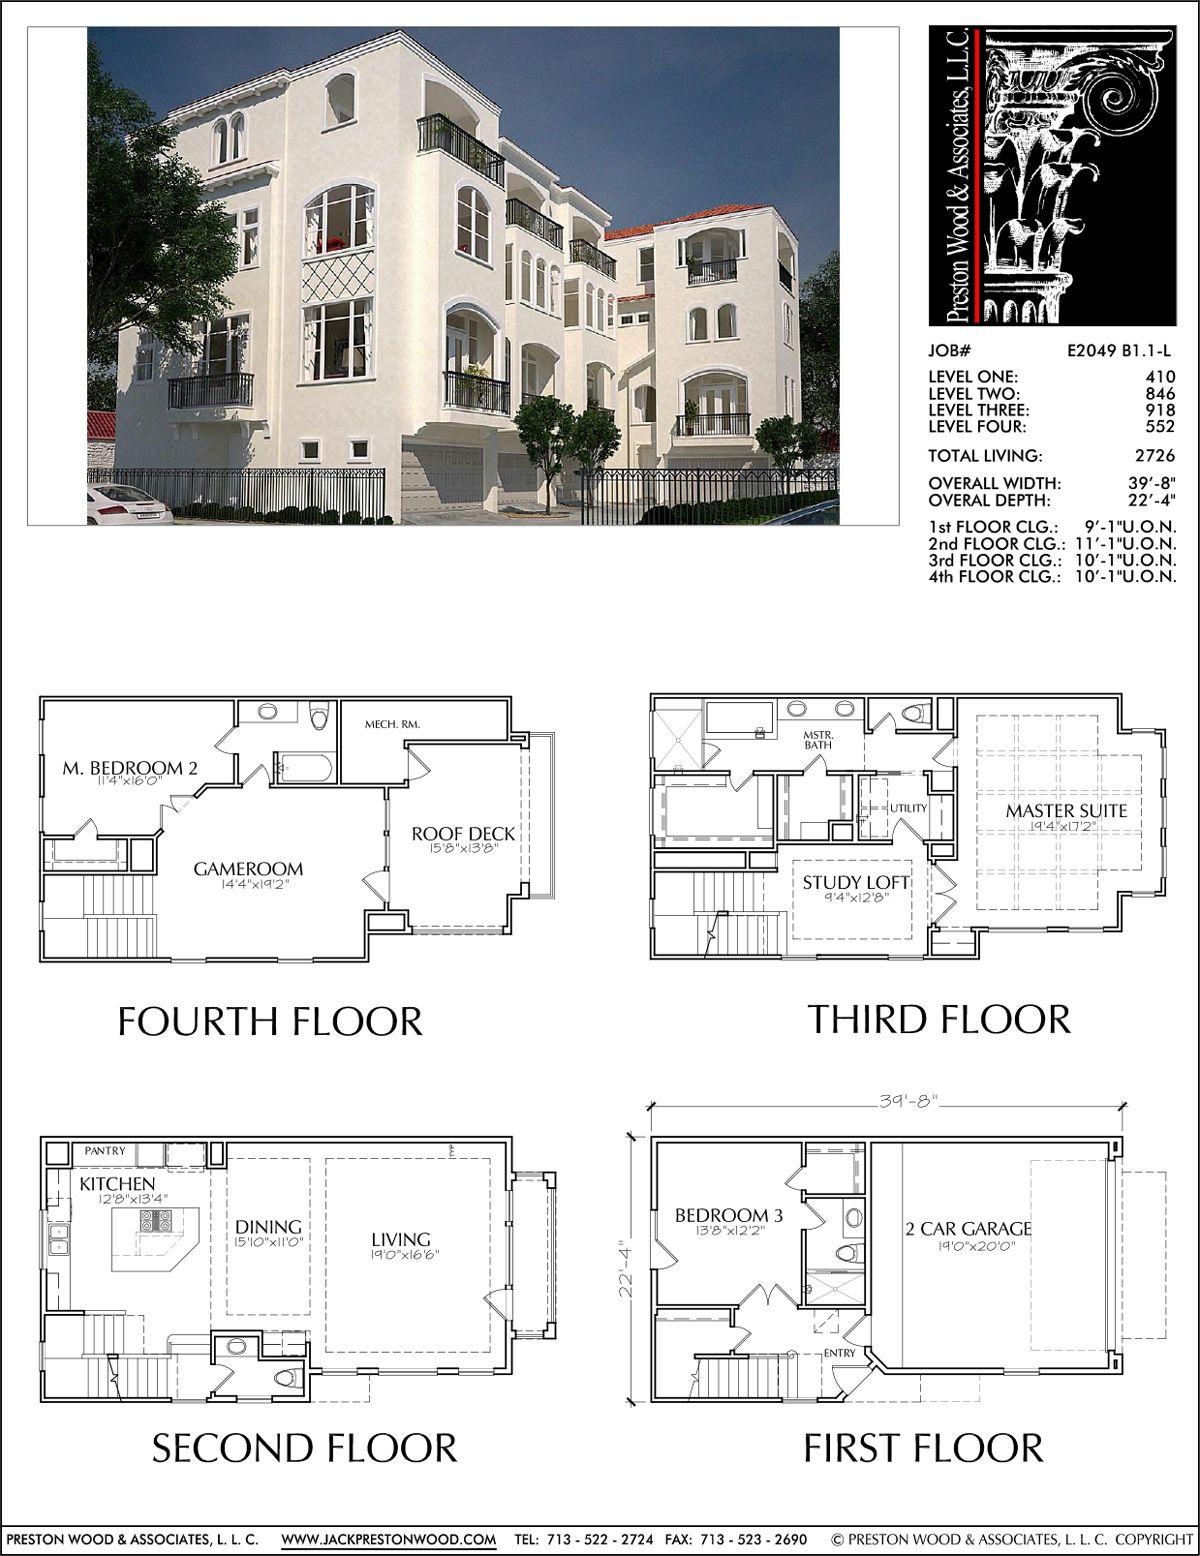 Four Story Duplex Townhouse Plan E2049 B1 1 Townhouse Designs Modern House Design Townhouse